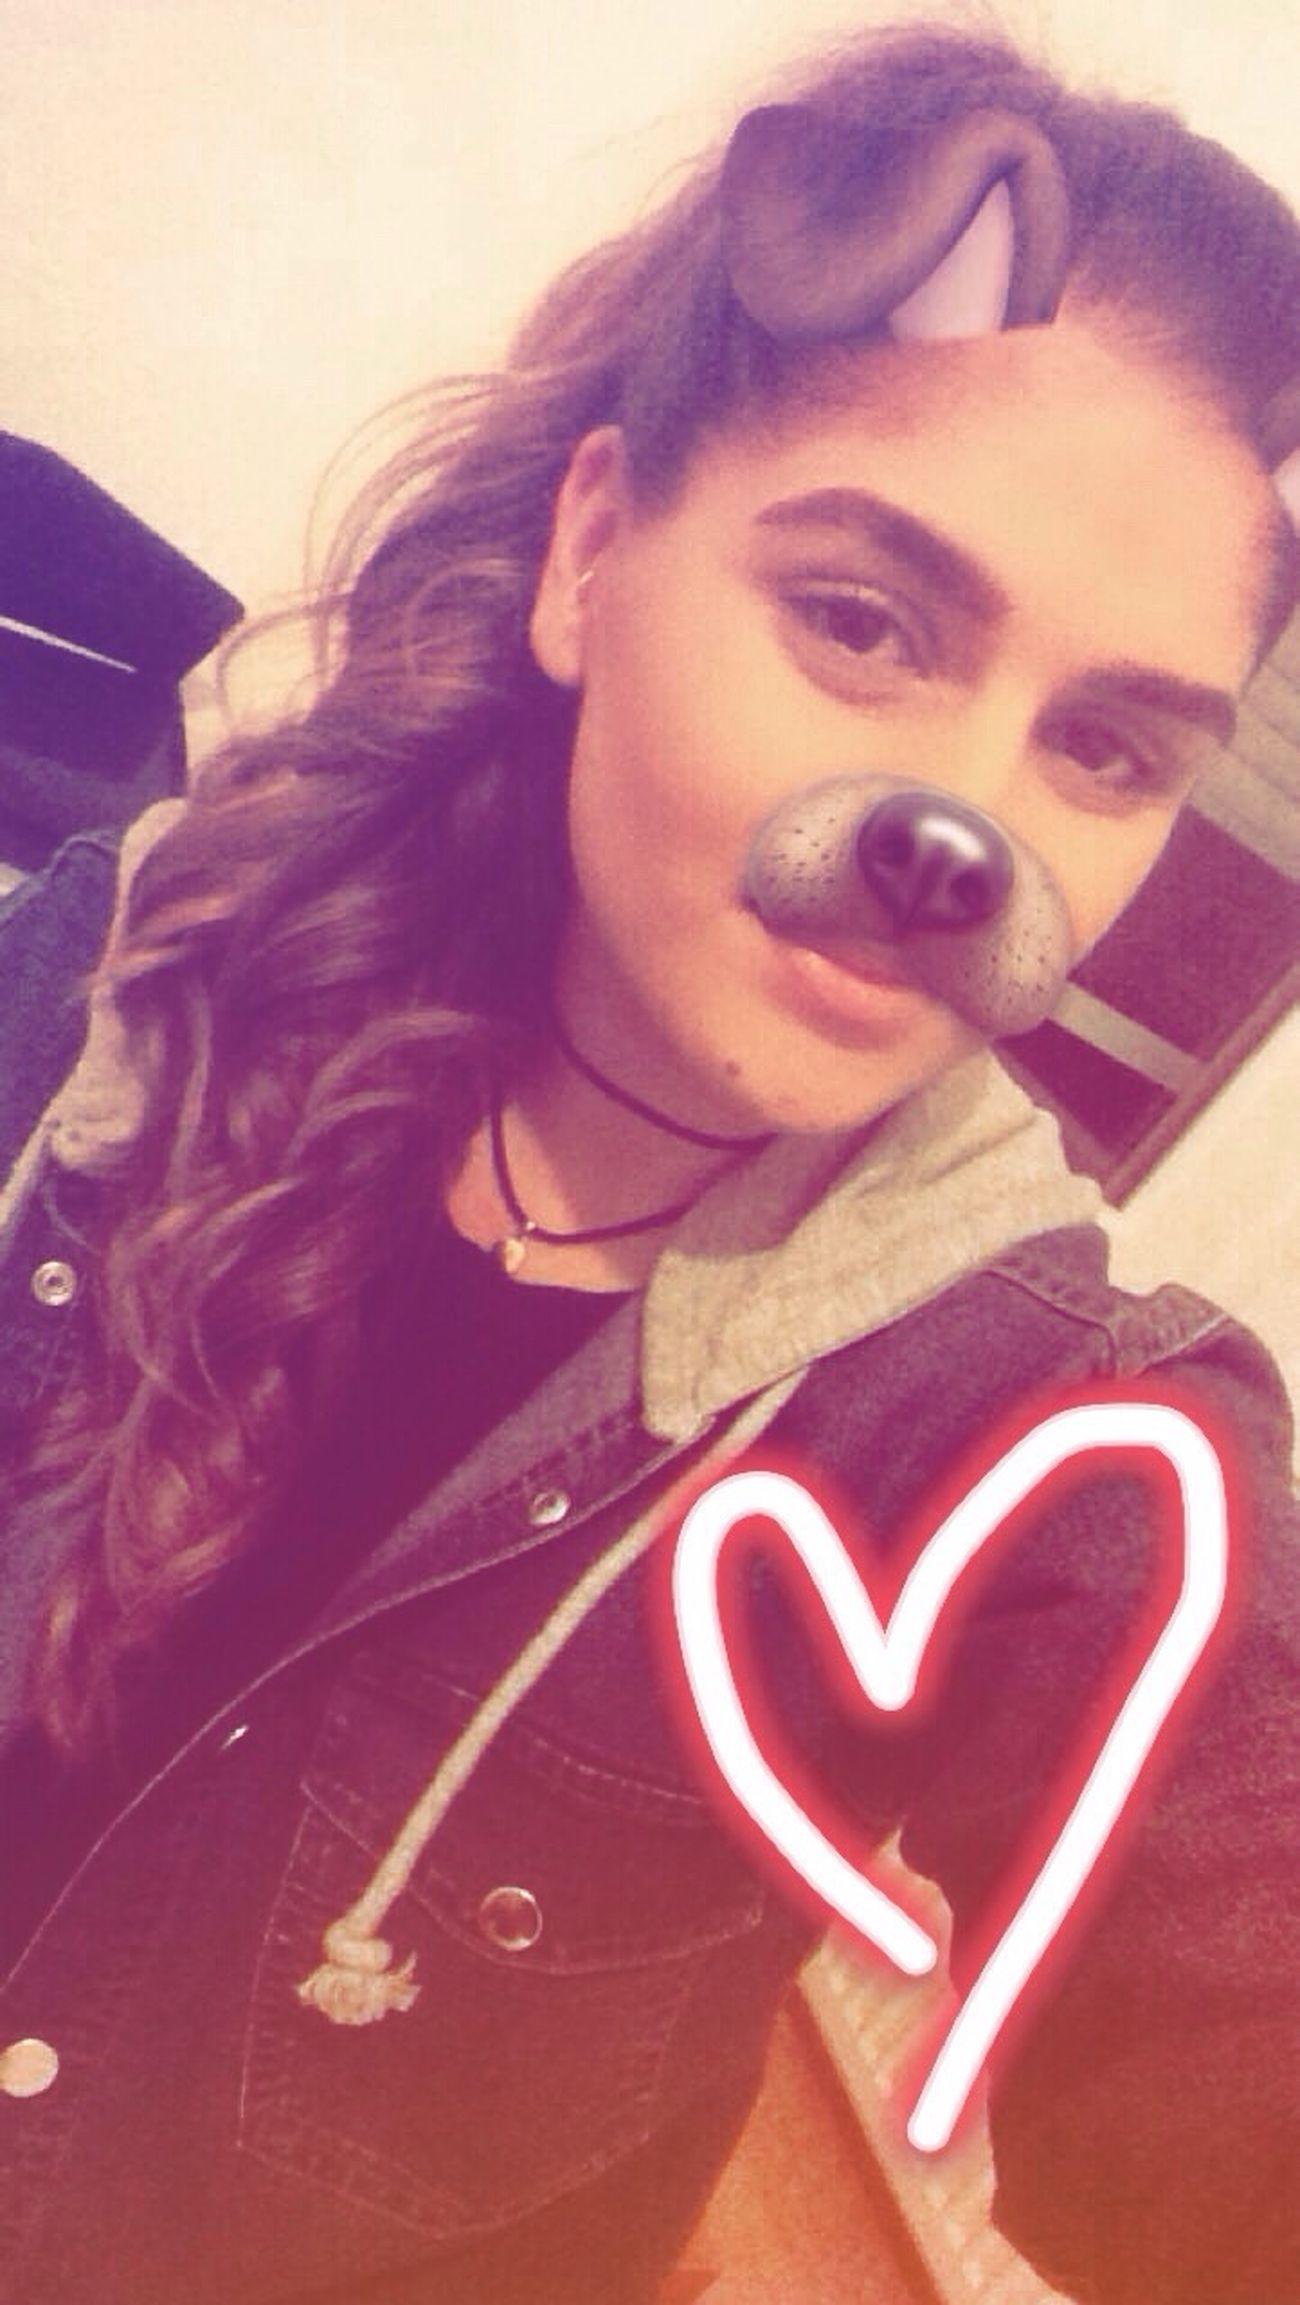 👻 Filterlove Snapchat Lifestyles Portrait Selfie ✌ Goodgirl Followme Beutiful  Smiling Love Choker Curly Hair